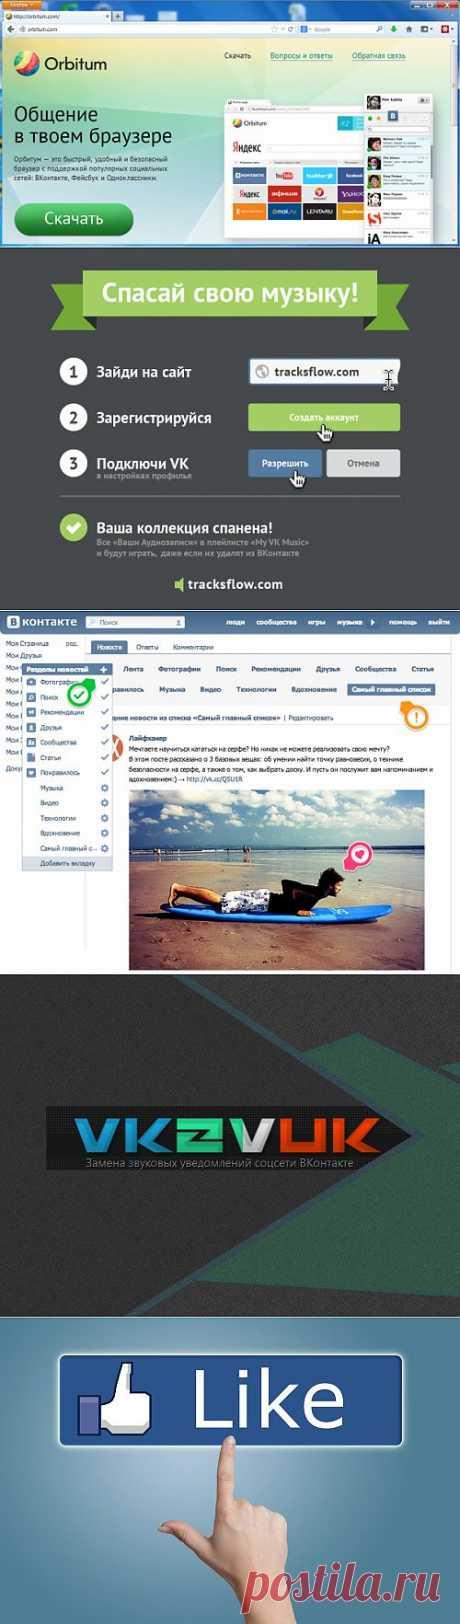 ВКонтакте | Лайфхакер